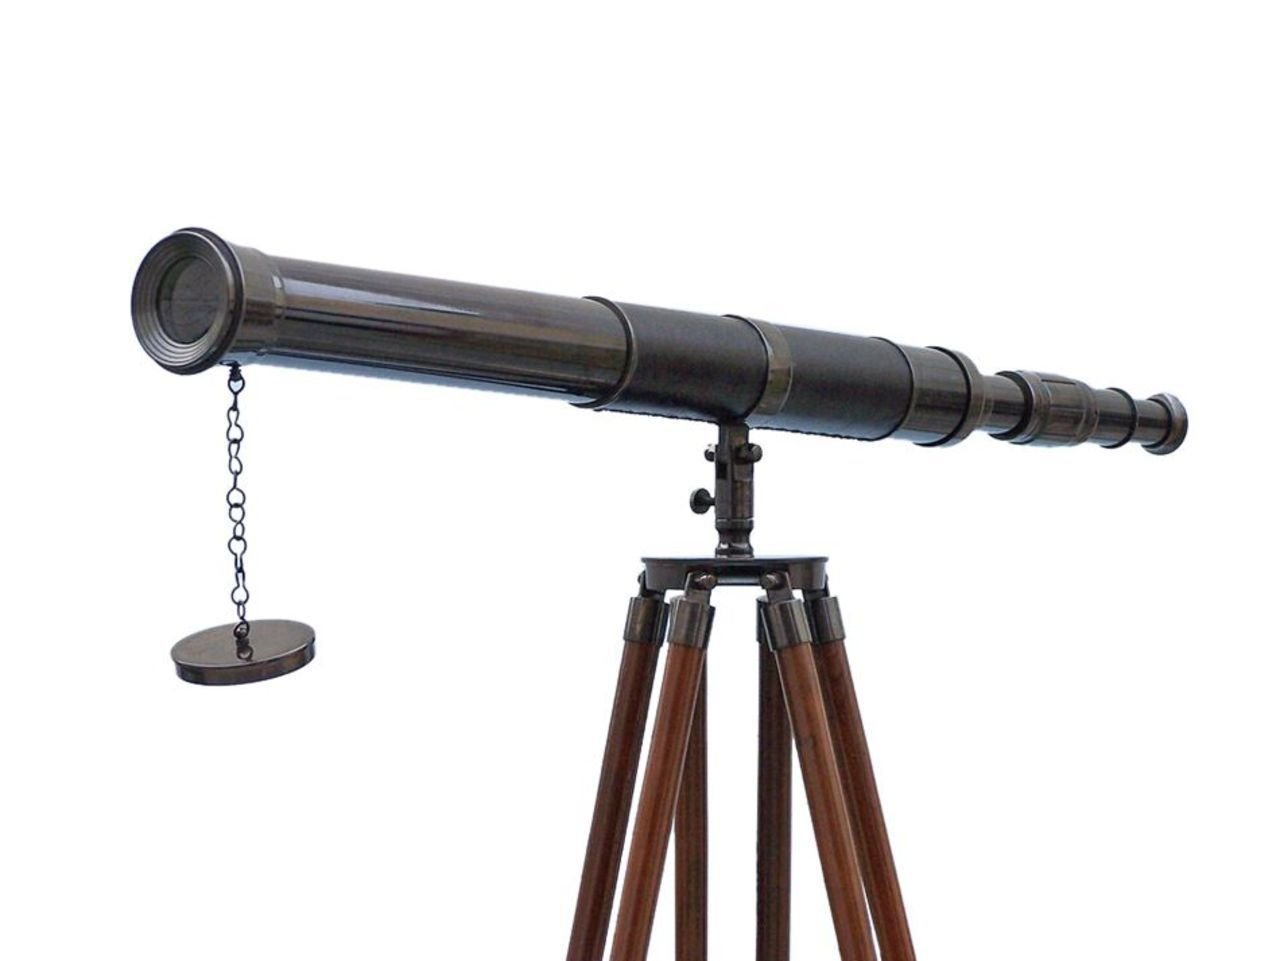 Hampton Nautical  Floor Standing Oil Rubbed Bronze - Leather Admiral Telescope 60'' - Nautical Home - Vintage Telescope